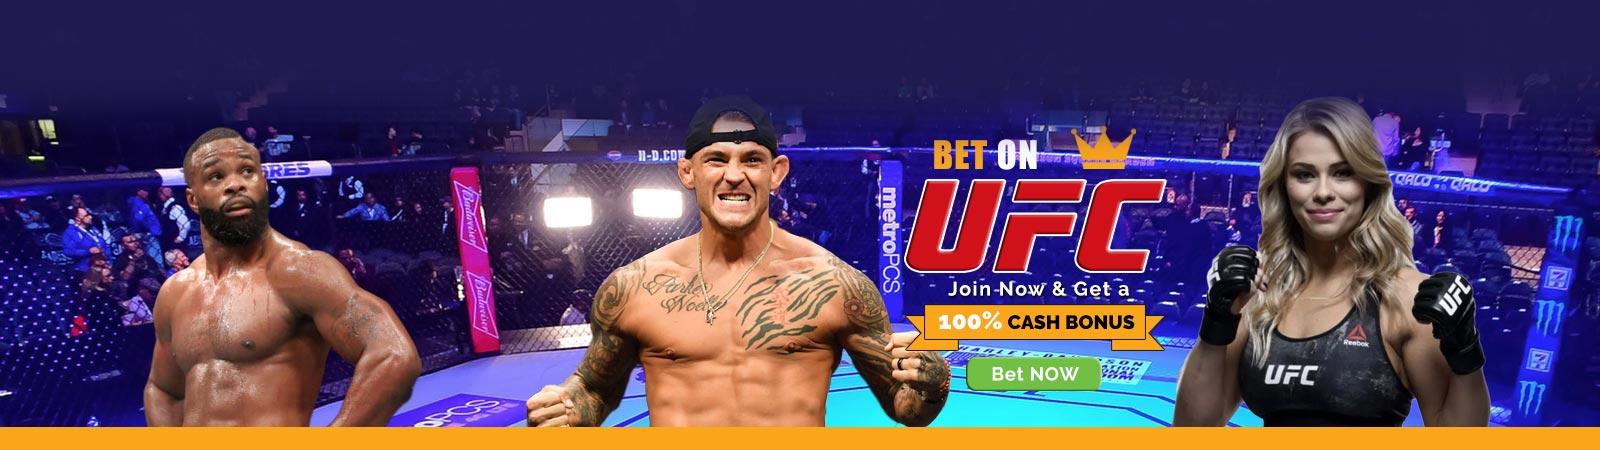 banner-UFC-cashbet